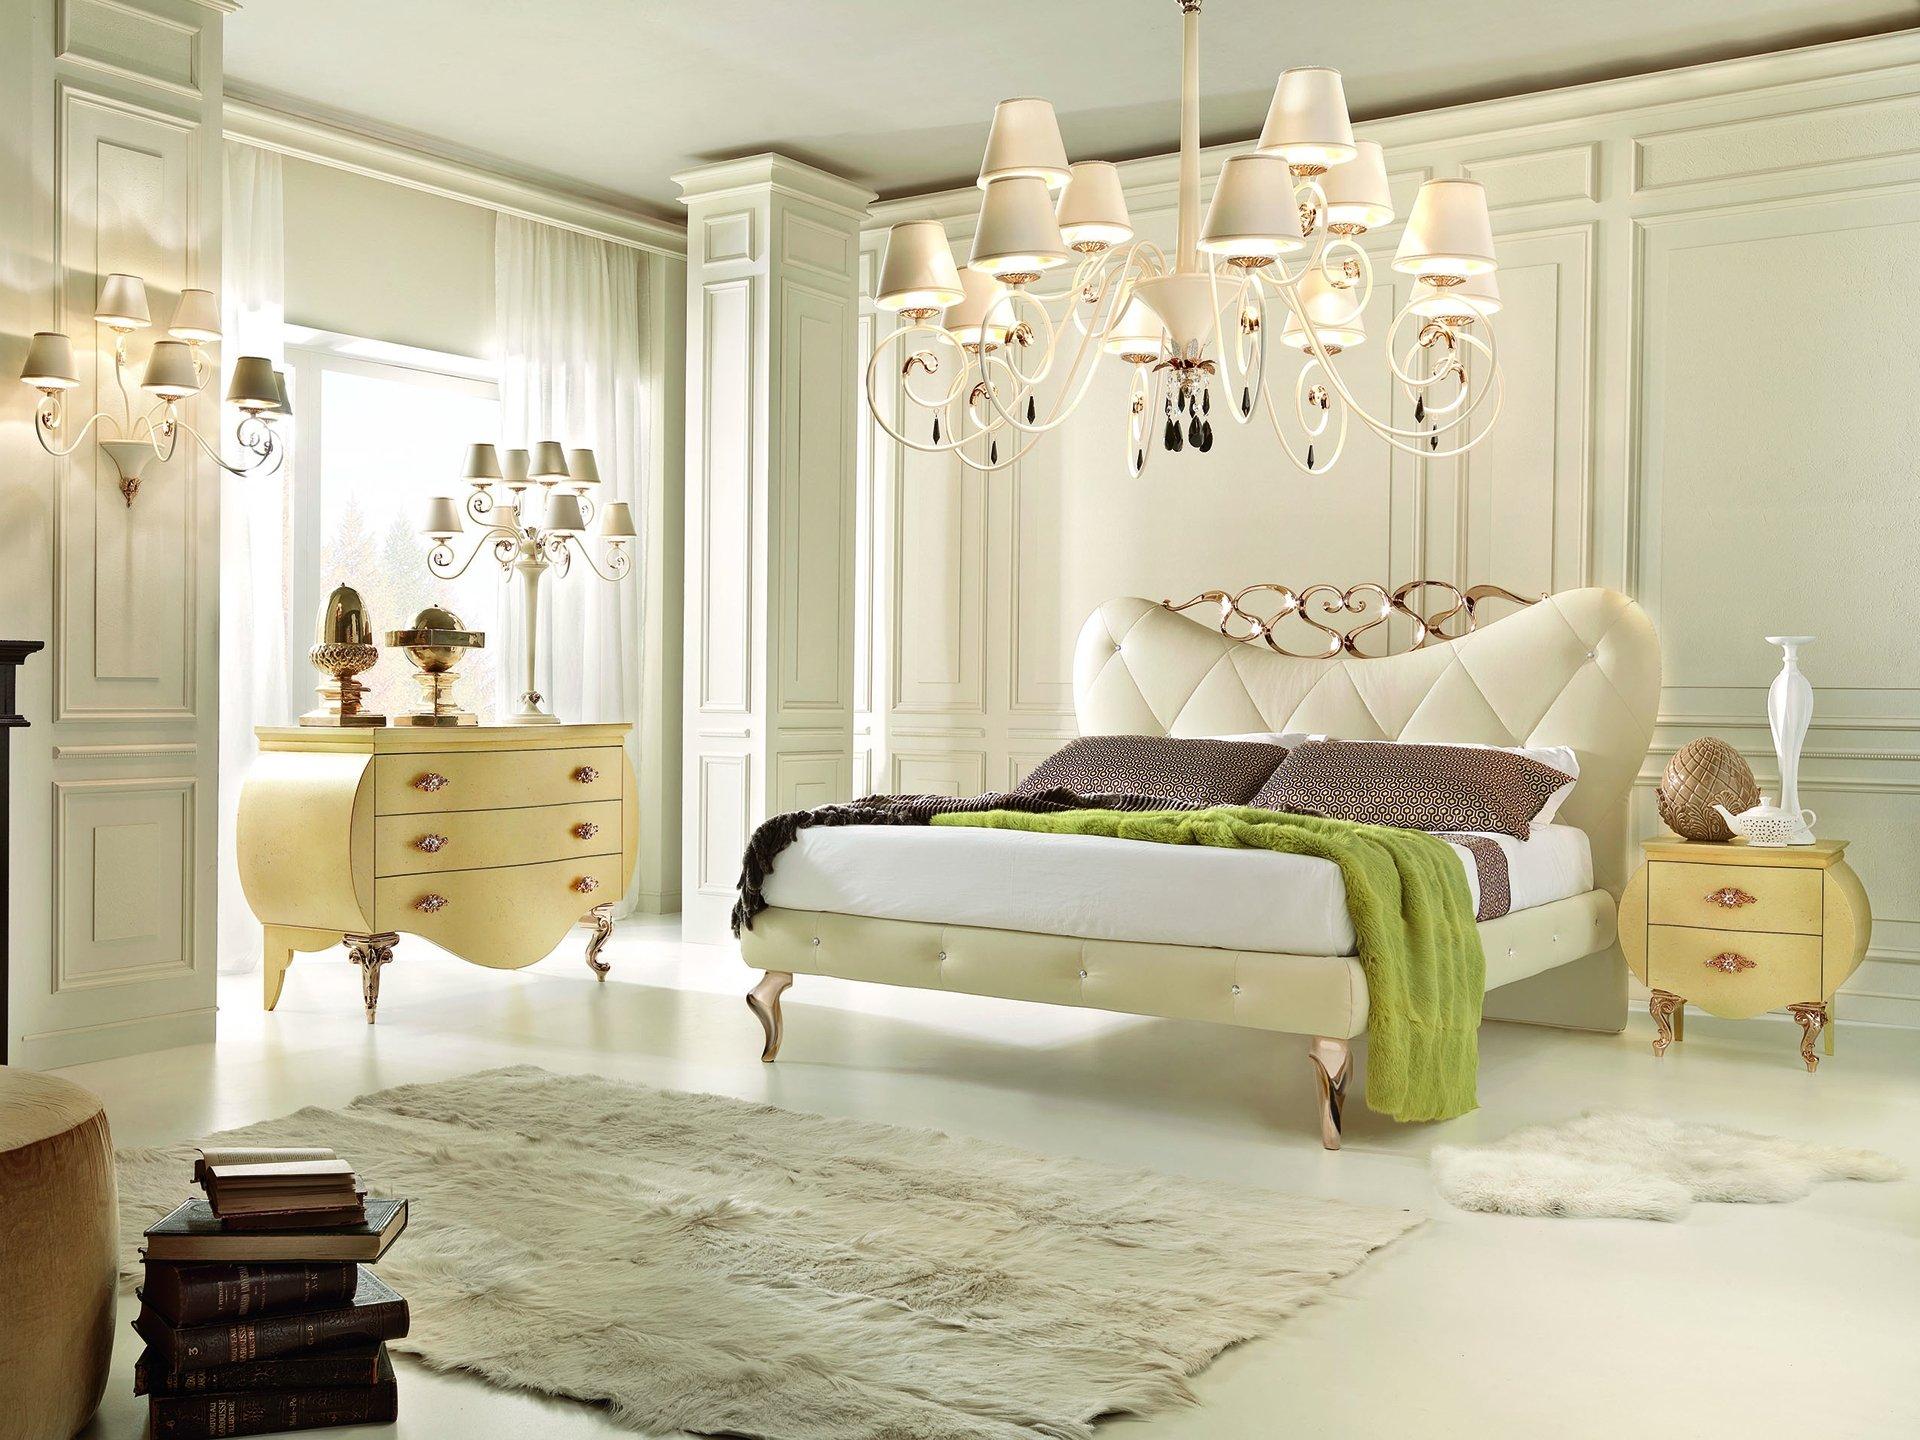 Кремово-белая спальня в стиле винтаж